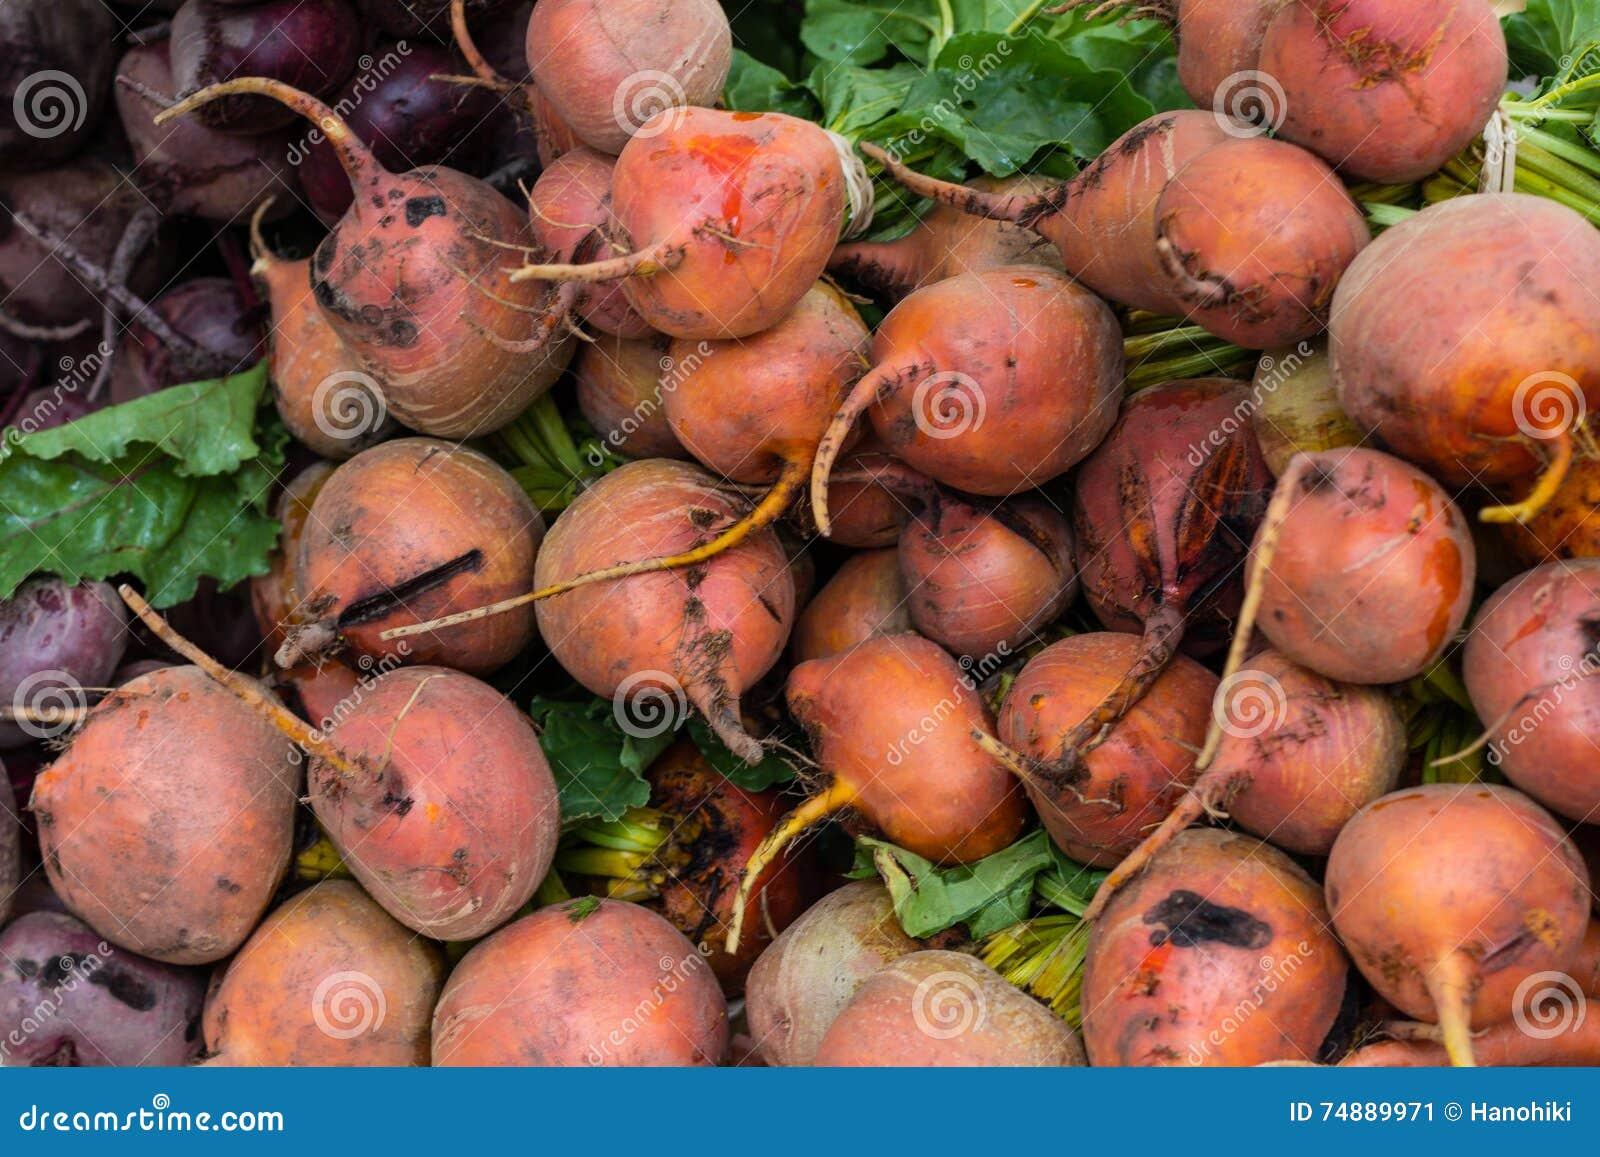 Remolacha, remolacha roja - primer de la verdura cruda